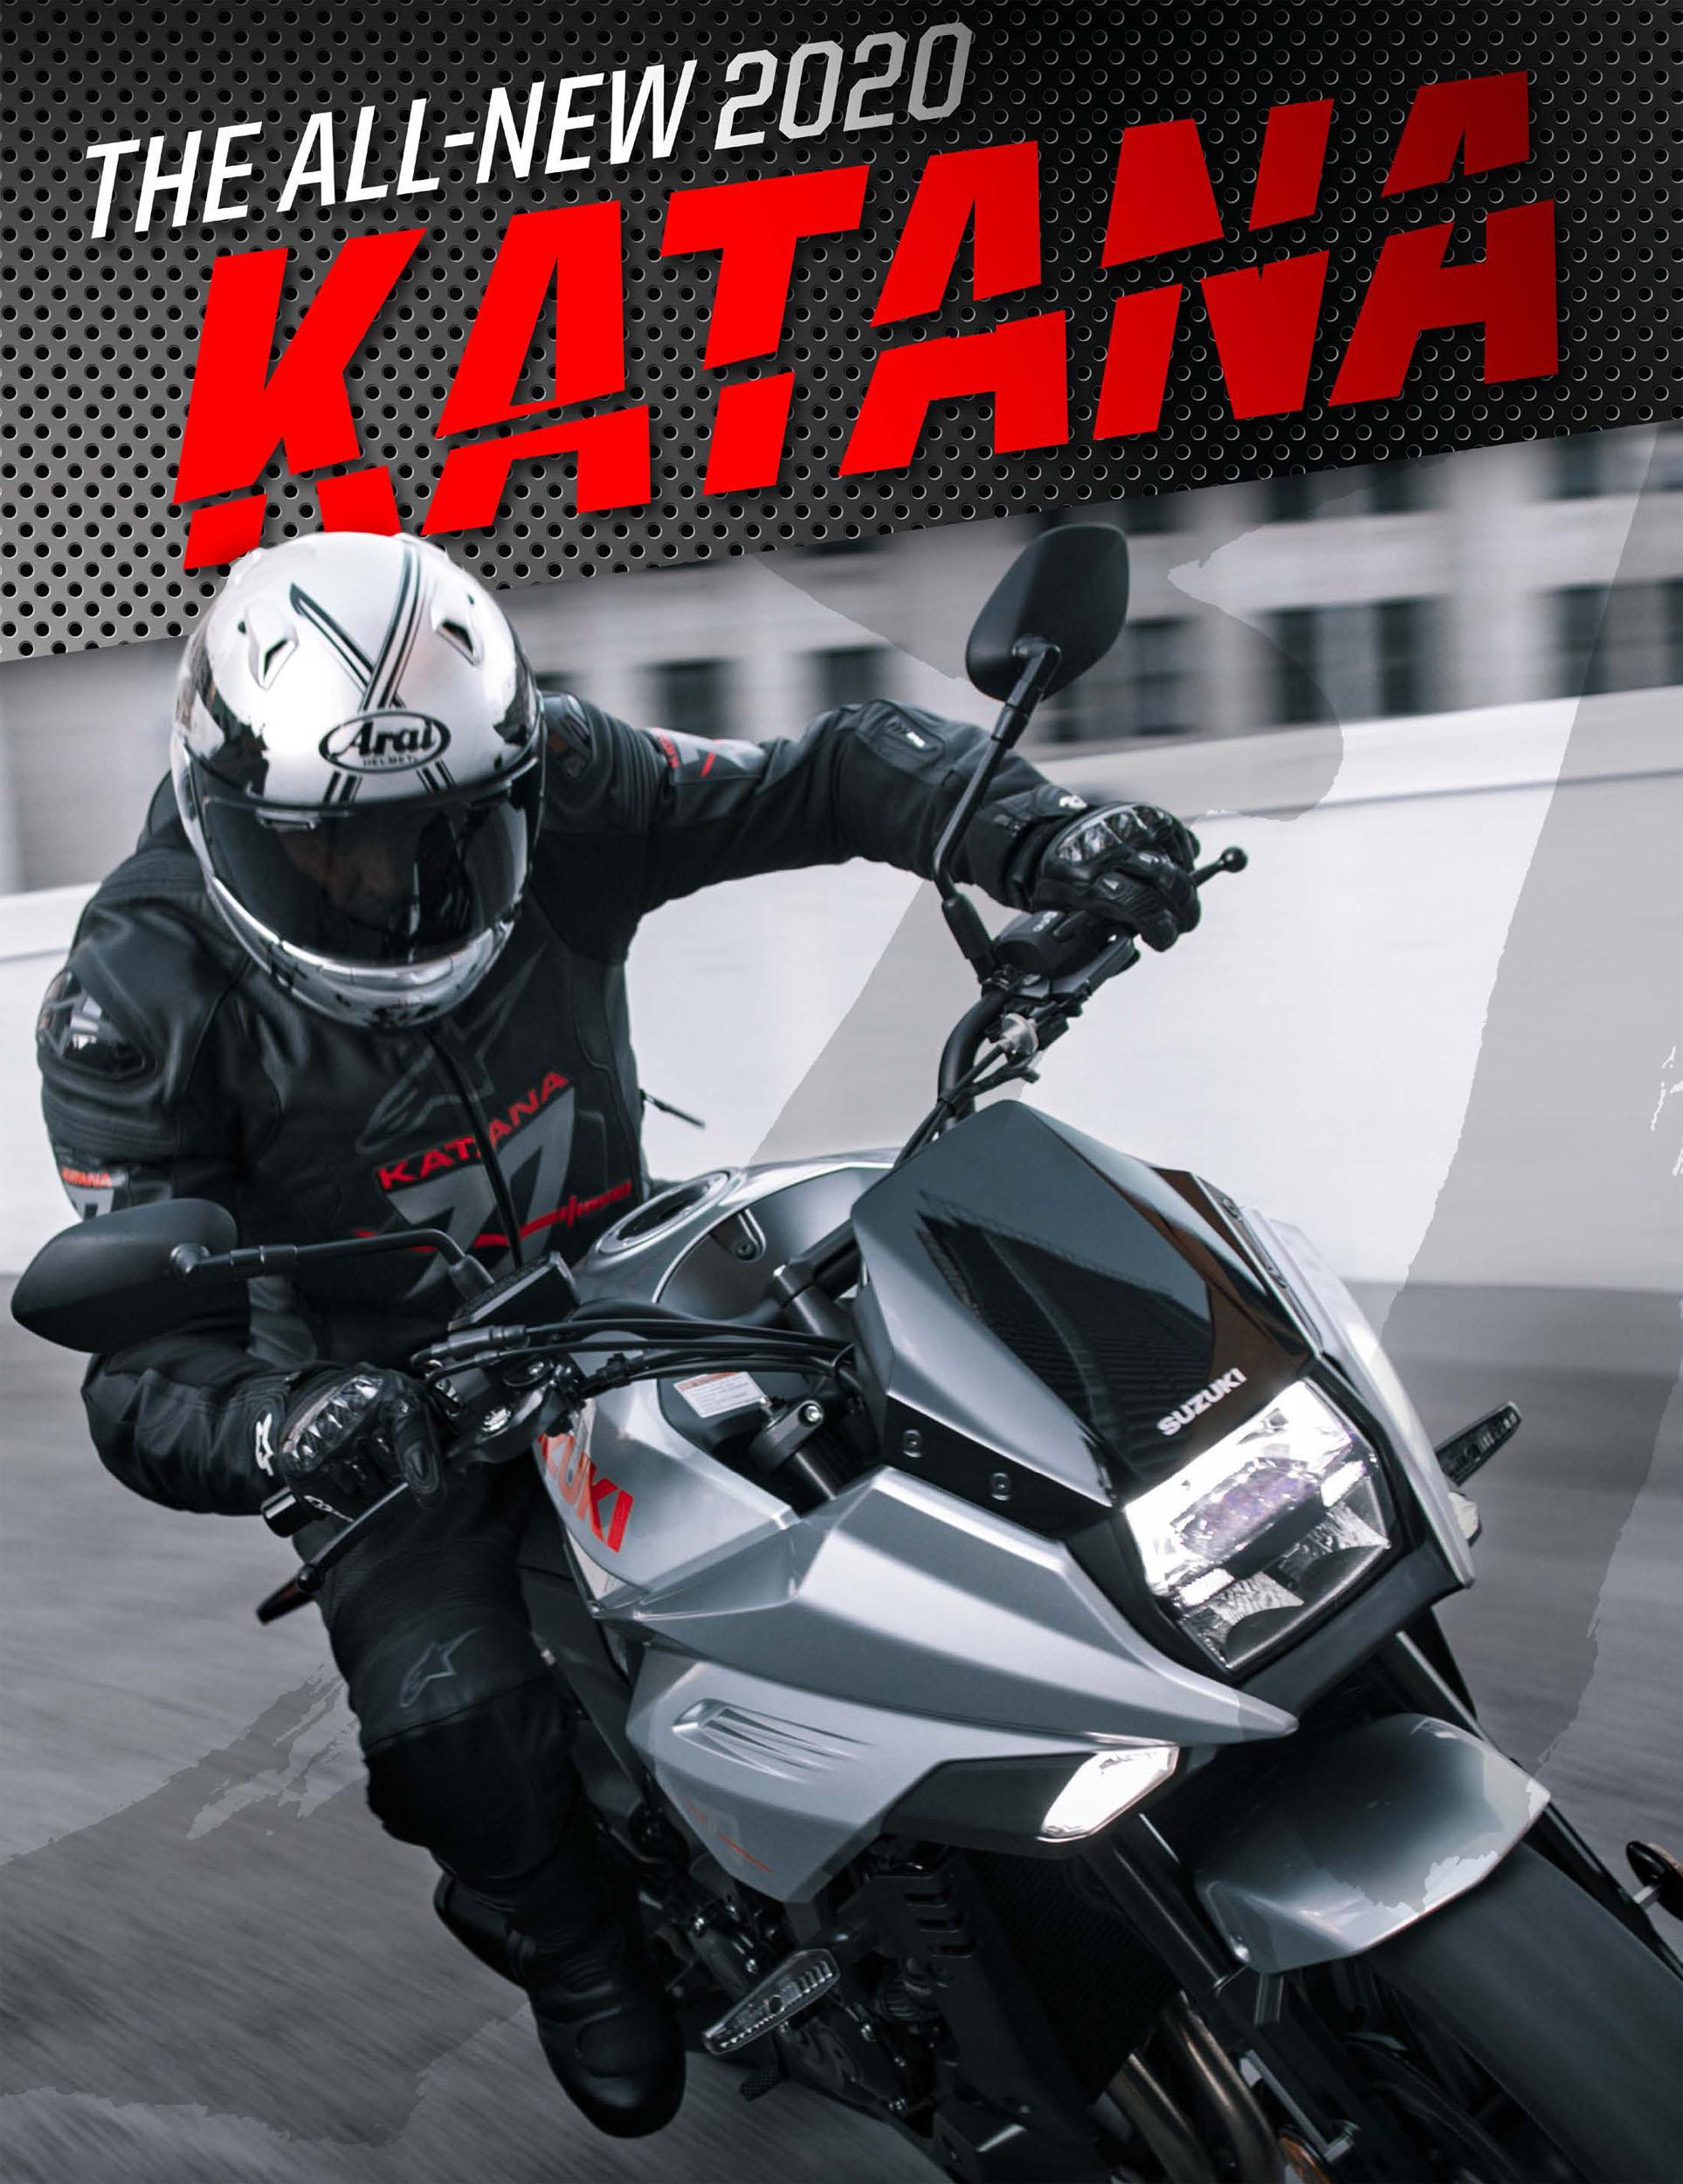 191114 Suzuki to Spotlight 2020 KATANA with Exclusive First-Ever U.S. Demo at IMS Long Beach